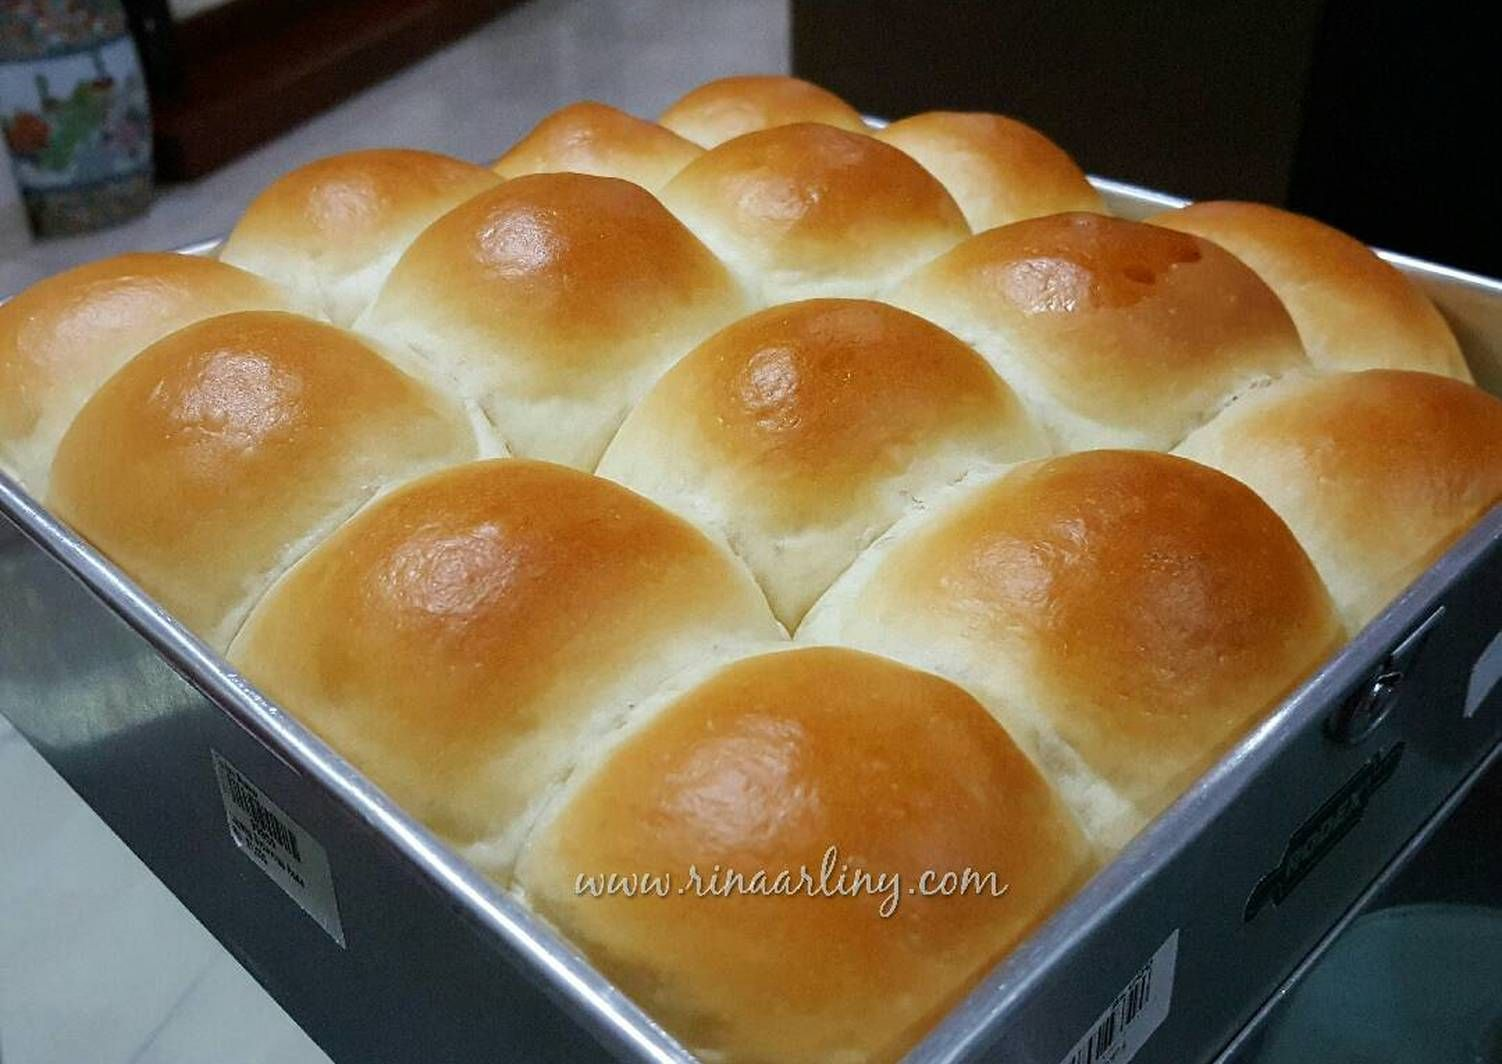 Resep Roti Sobek Oleh Rina Arliny Resep Resep Roti Rotis Resep